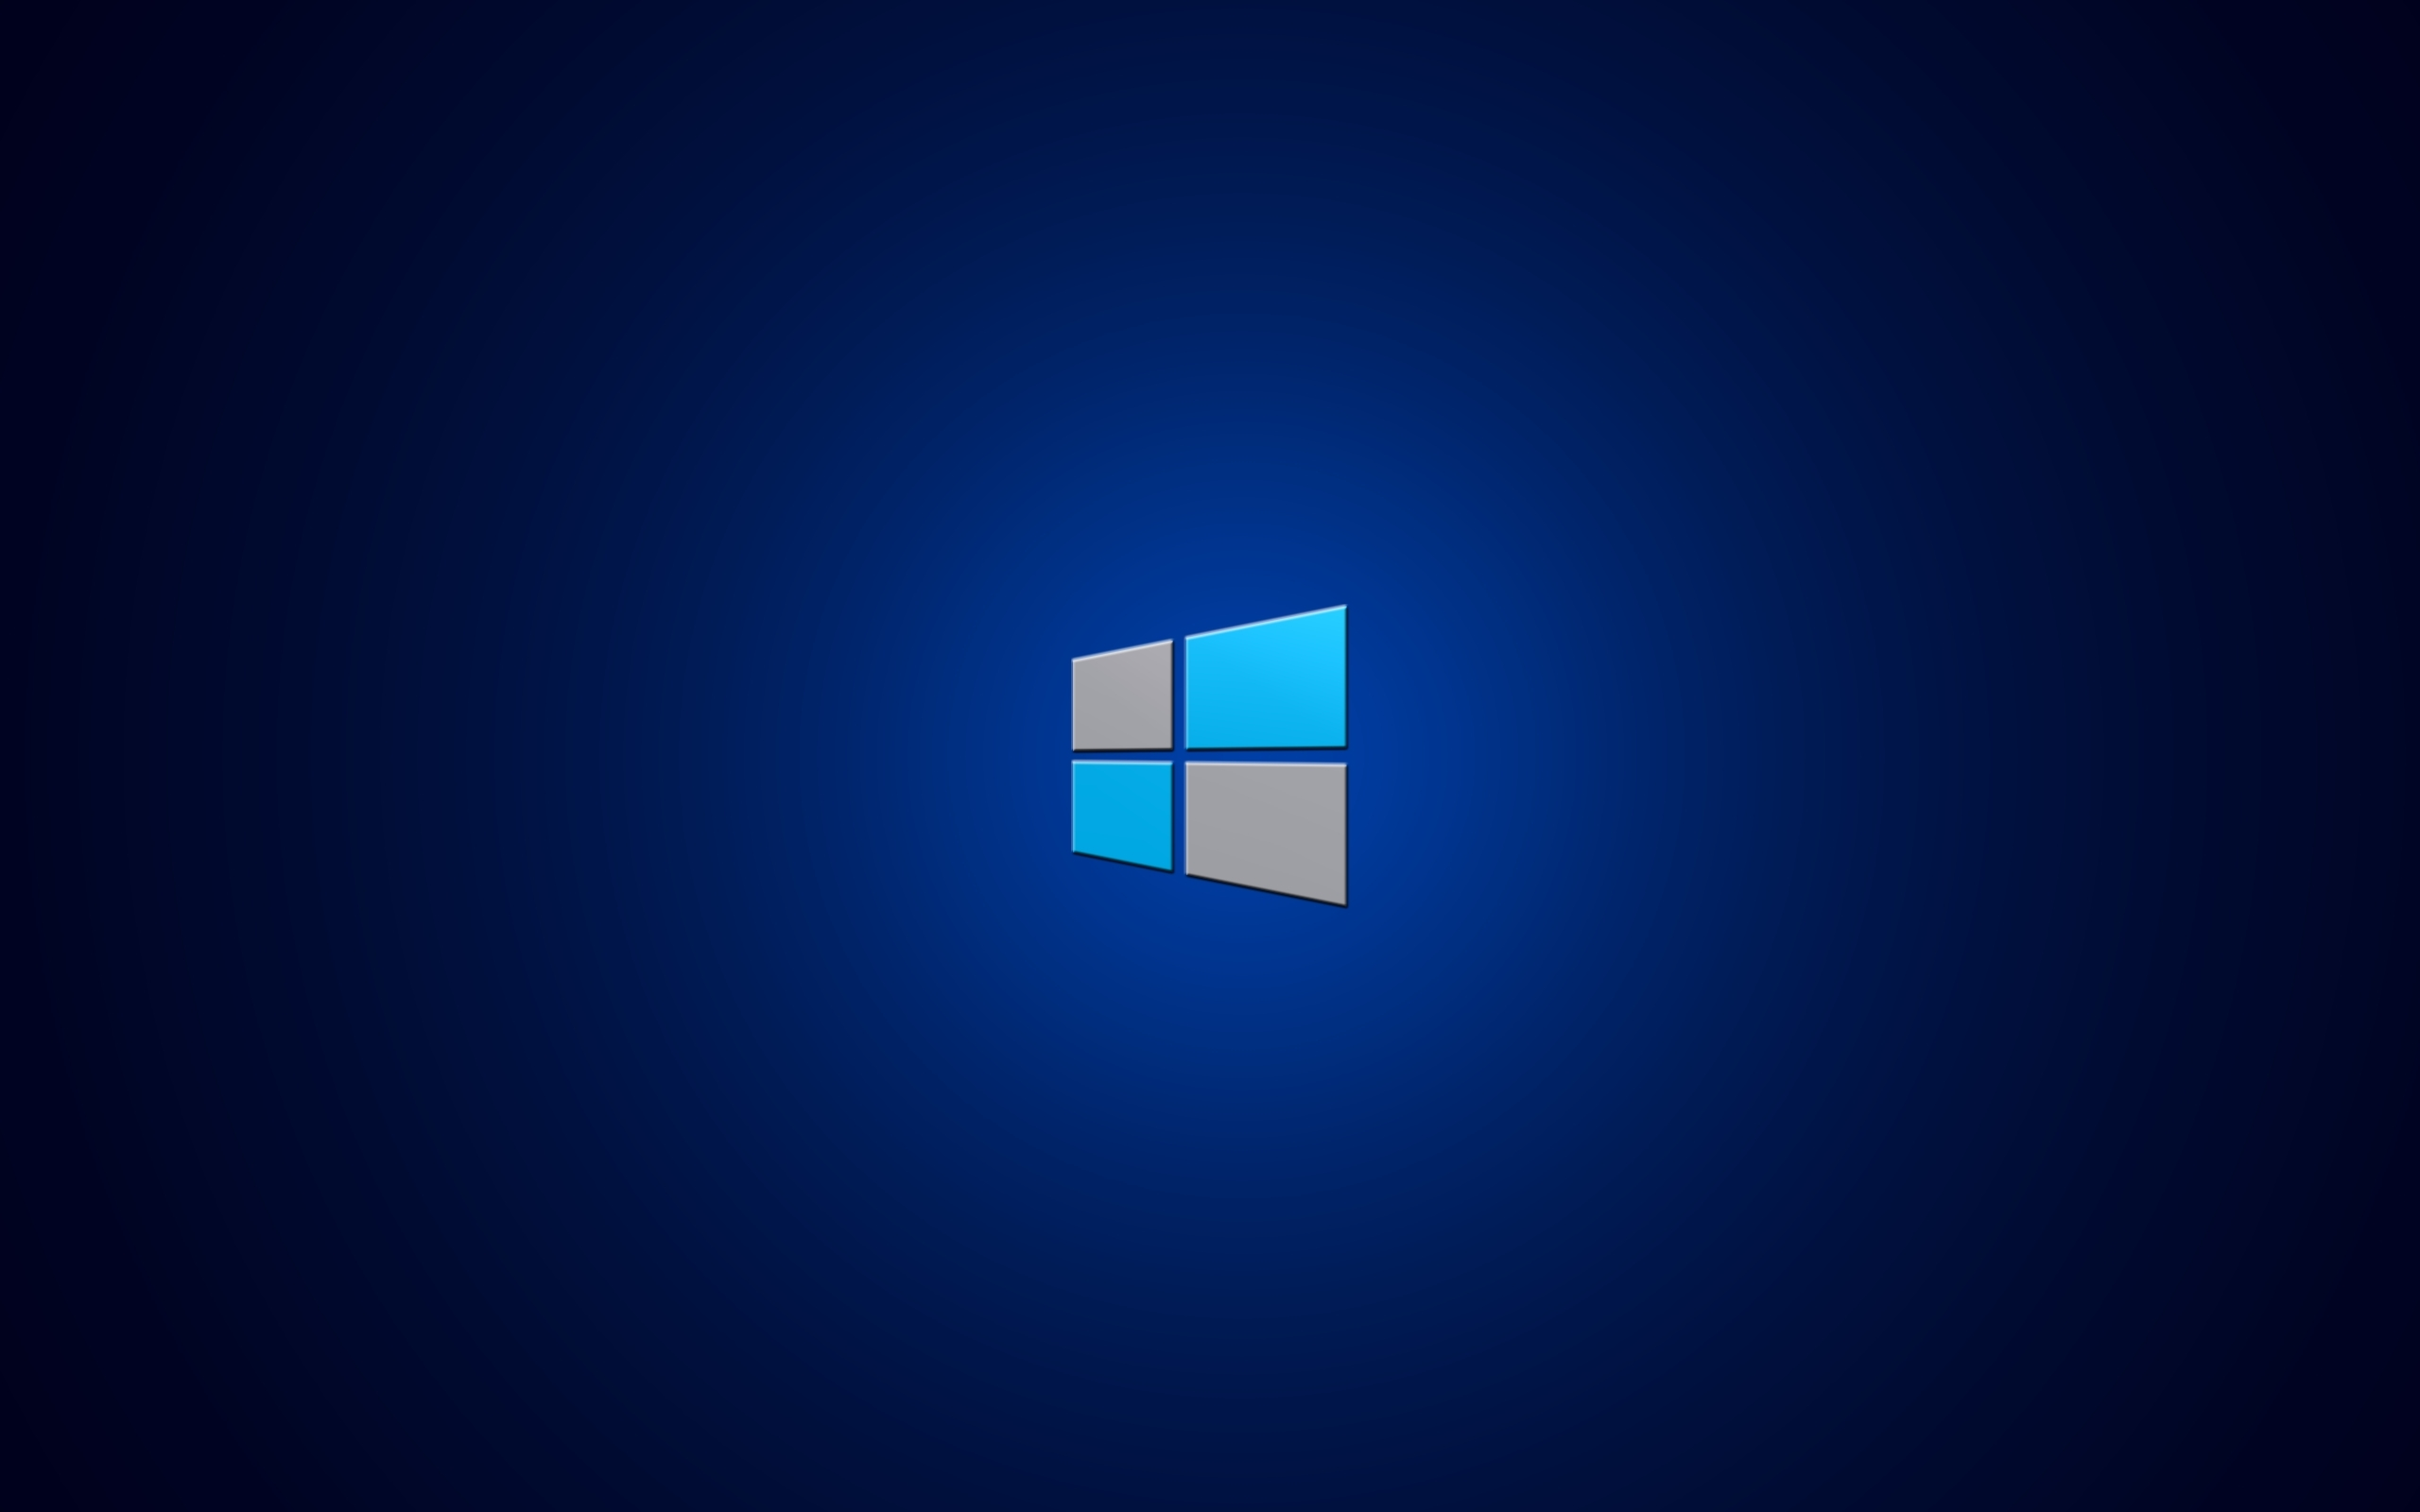 50 Windows 10 Setting Wallpaper On Wallpapersafari